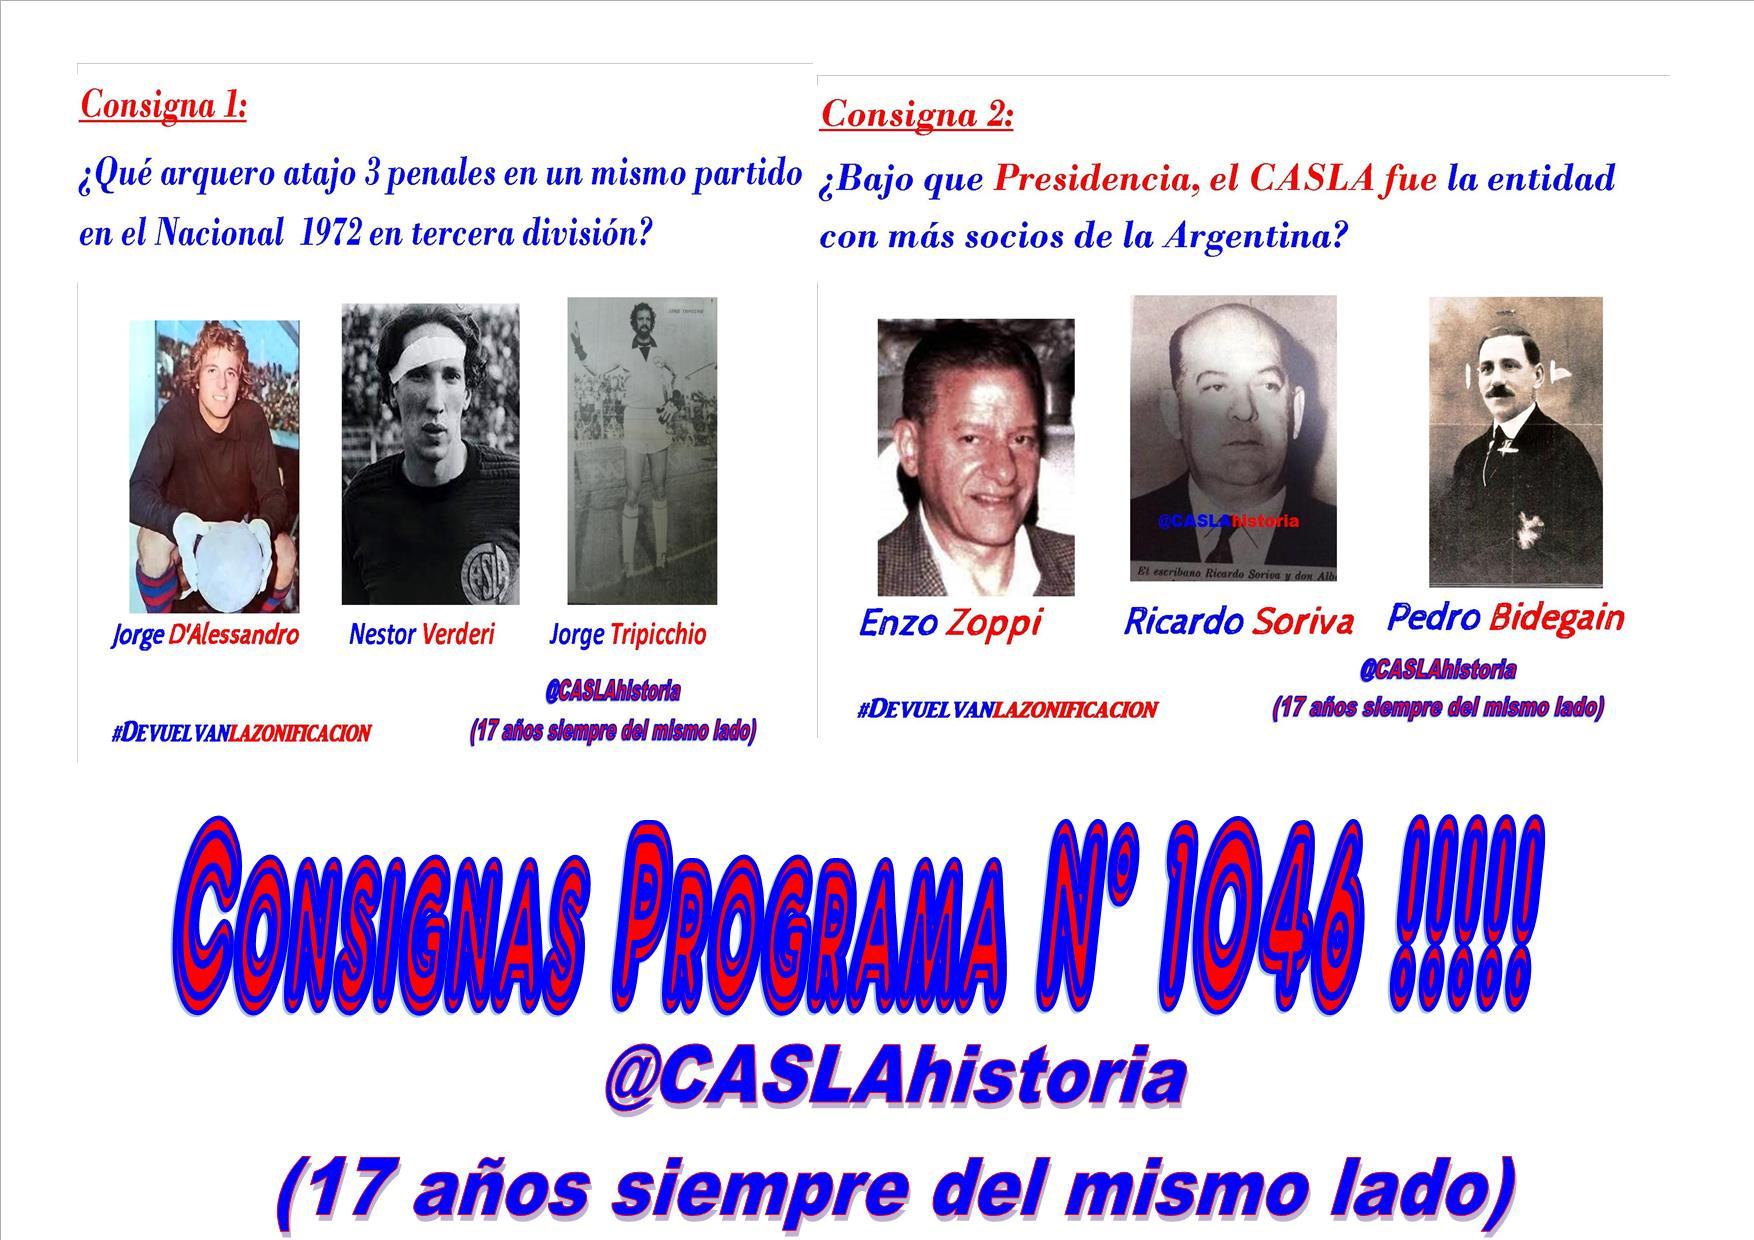 Consignas Programa N° 1046 !!!!!!